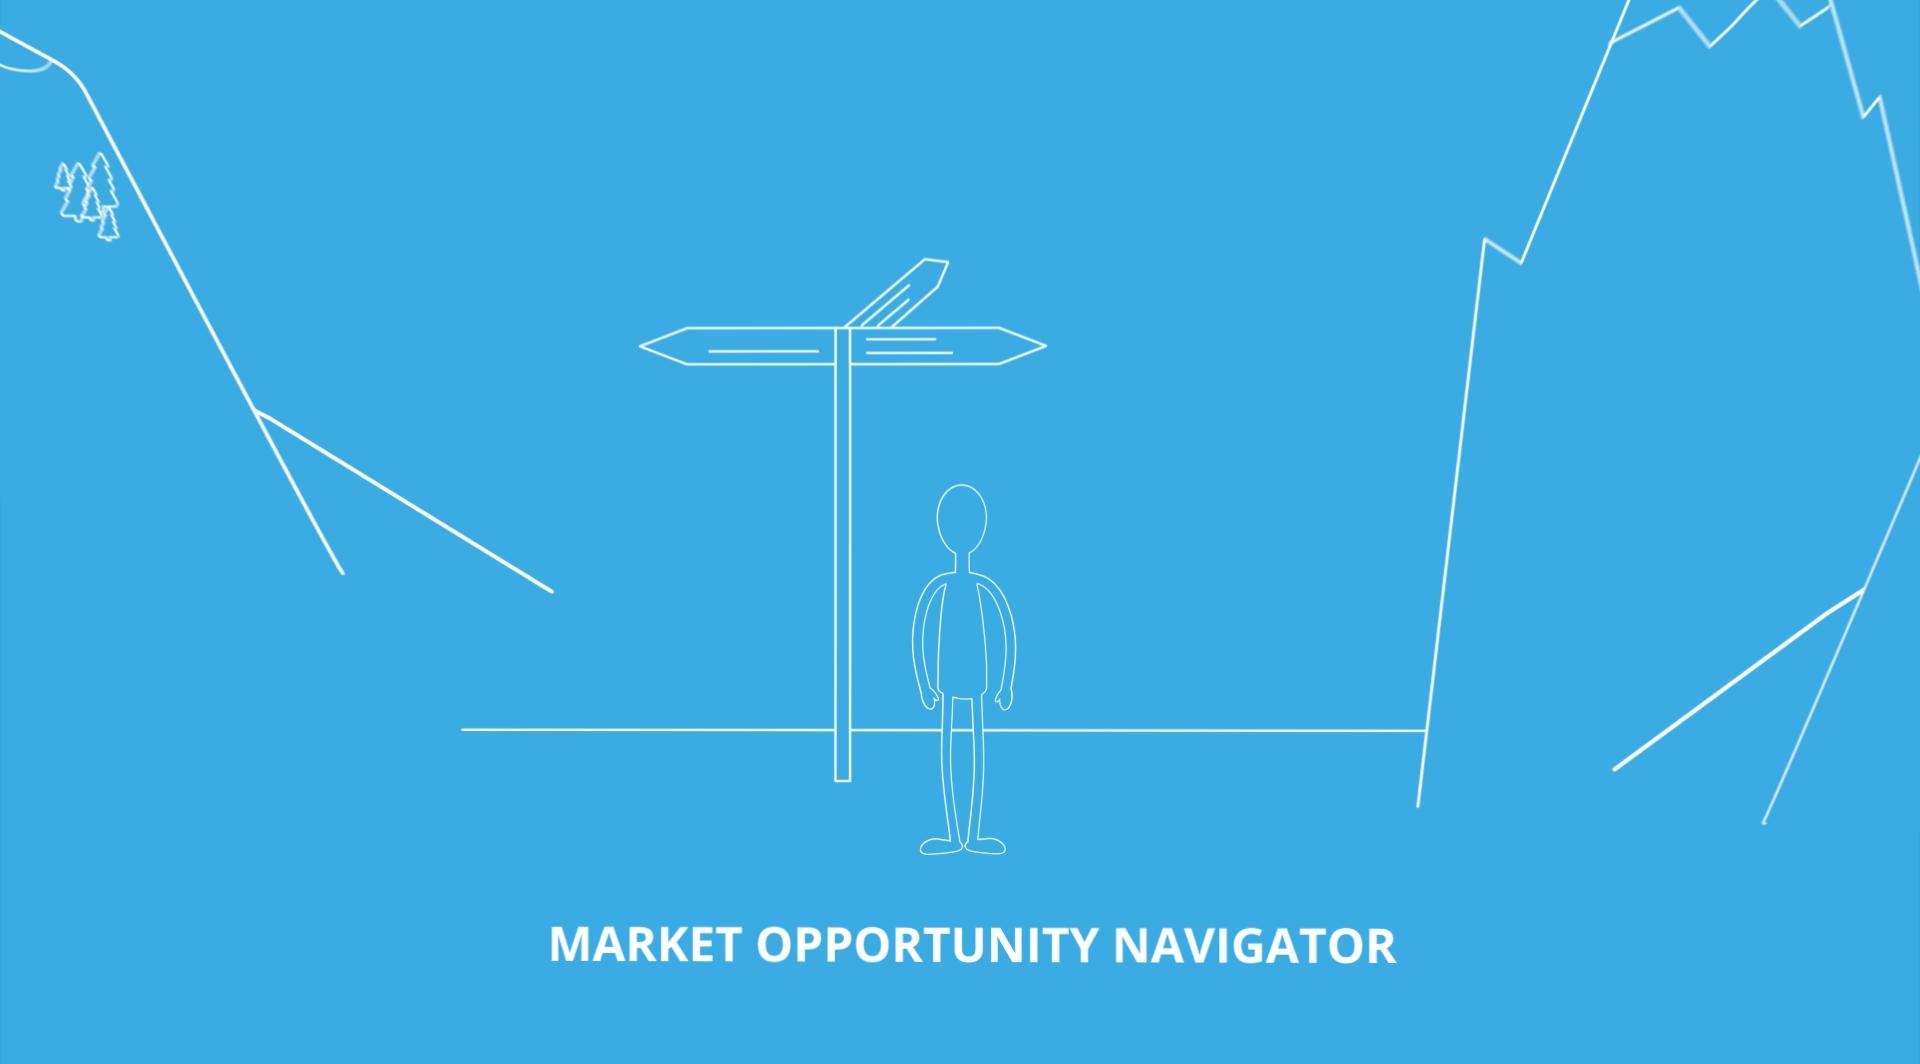 Market Opportunity Navigator